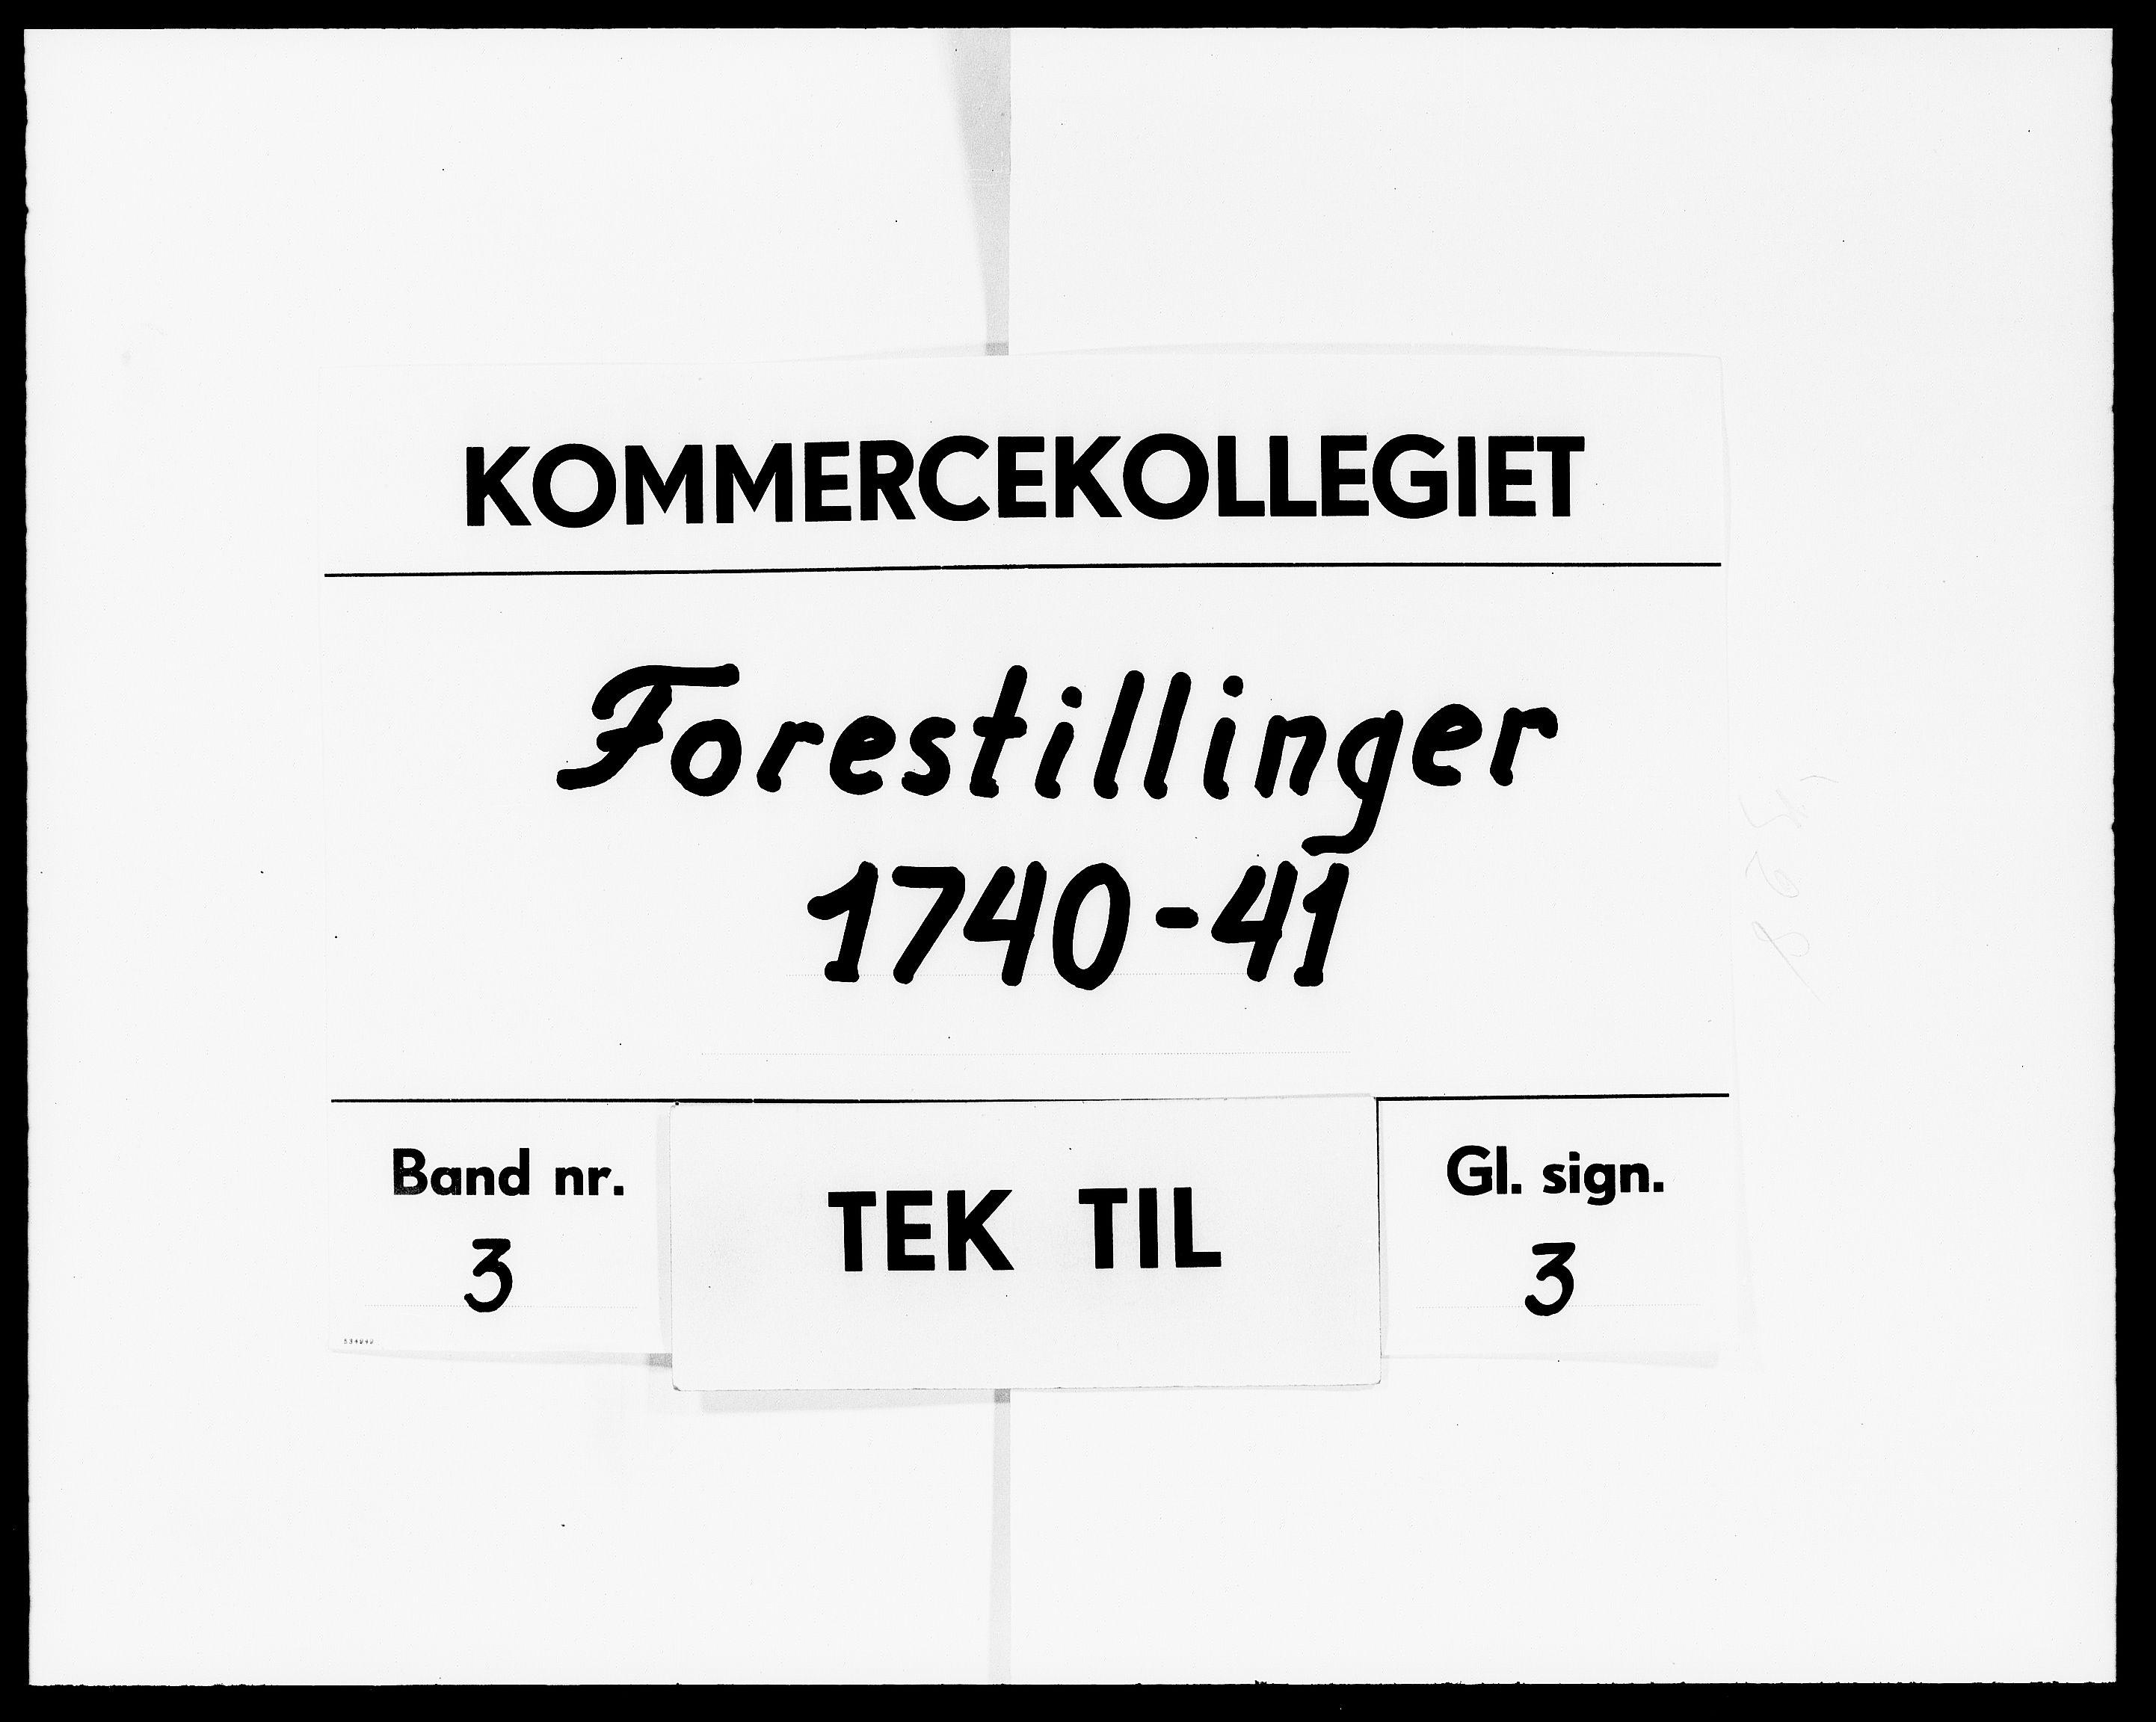 DRA, Kommercekollegiet, Dansk-Norske Sekretariat (1736-1771) / Kommercedeputationen (1771-1773), -/003: Forestillinger, 1740-1741